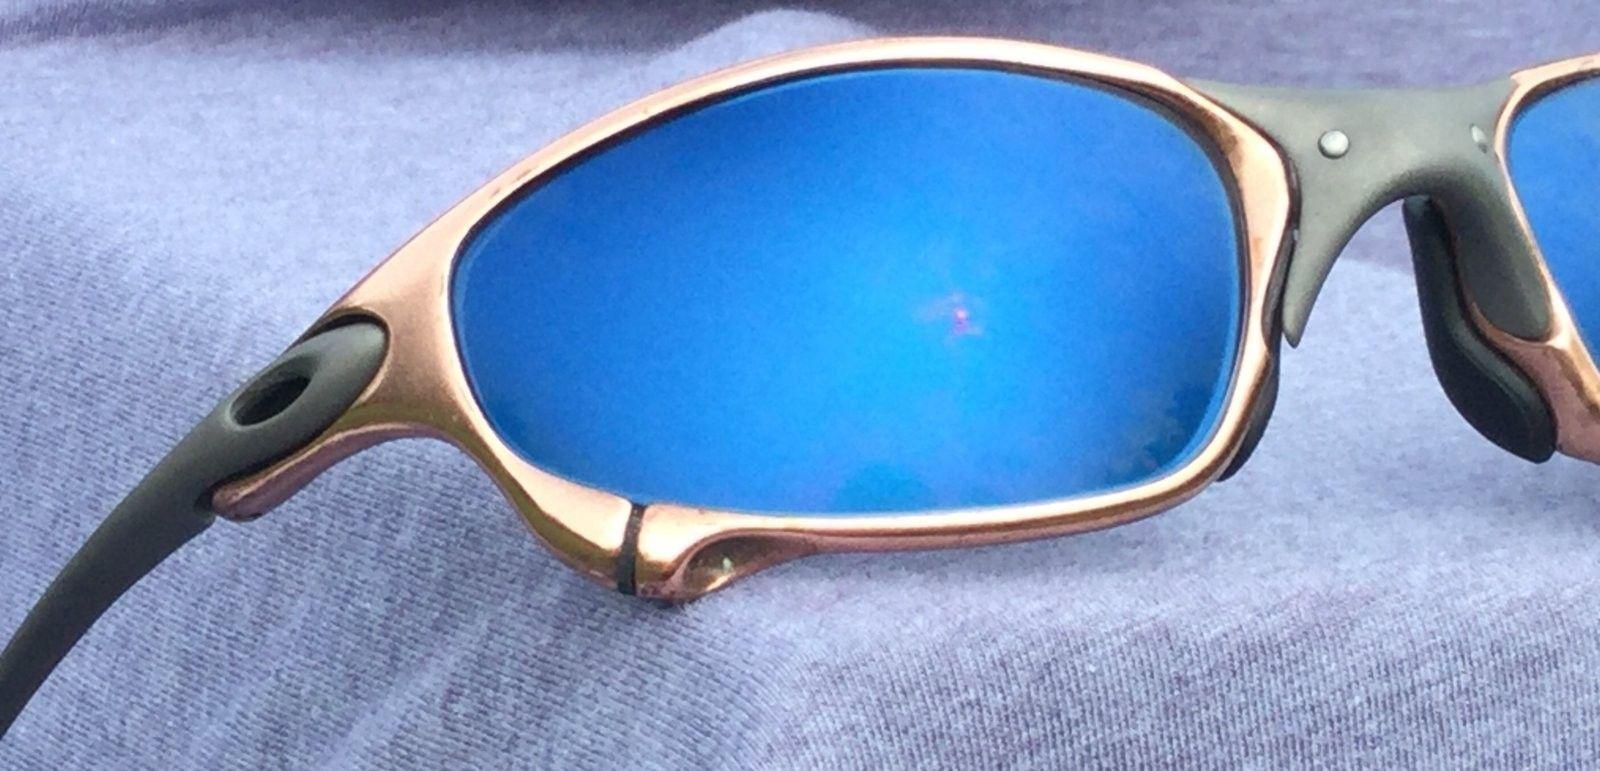 More Matte Lenses in X-Metals (Juliets & XX) - image.jpeg